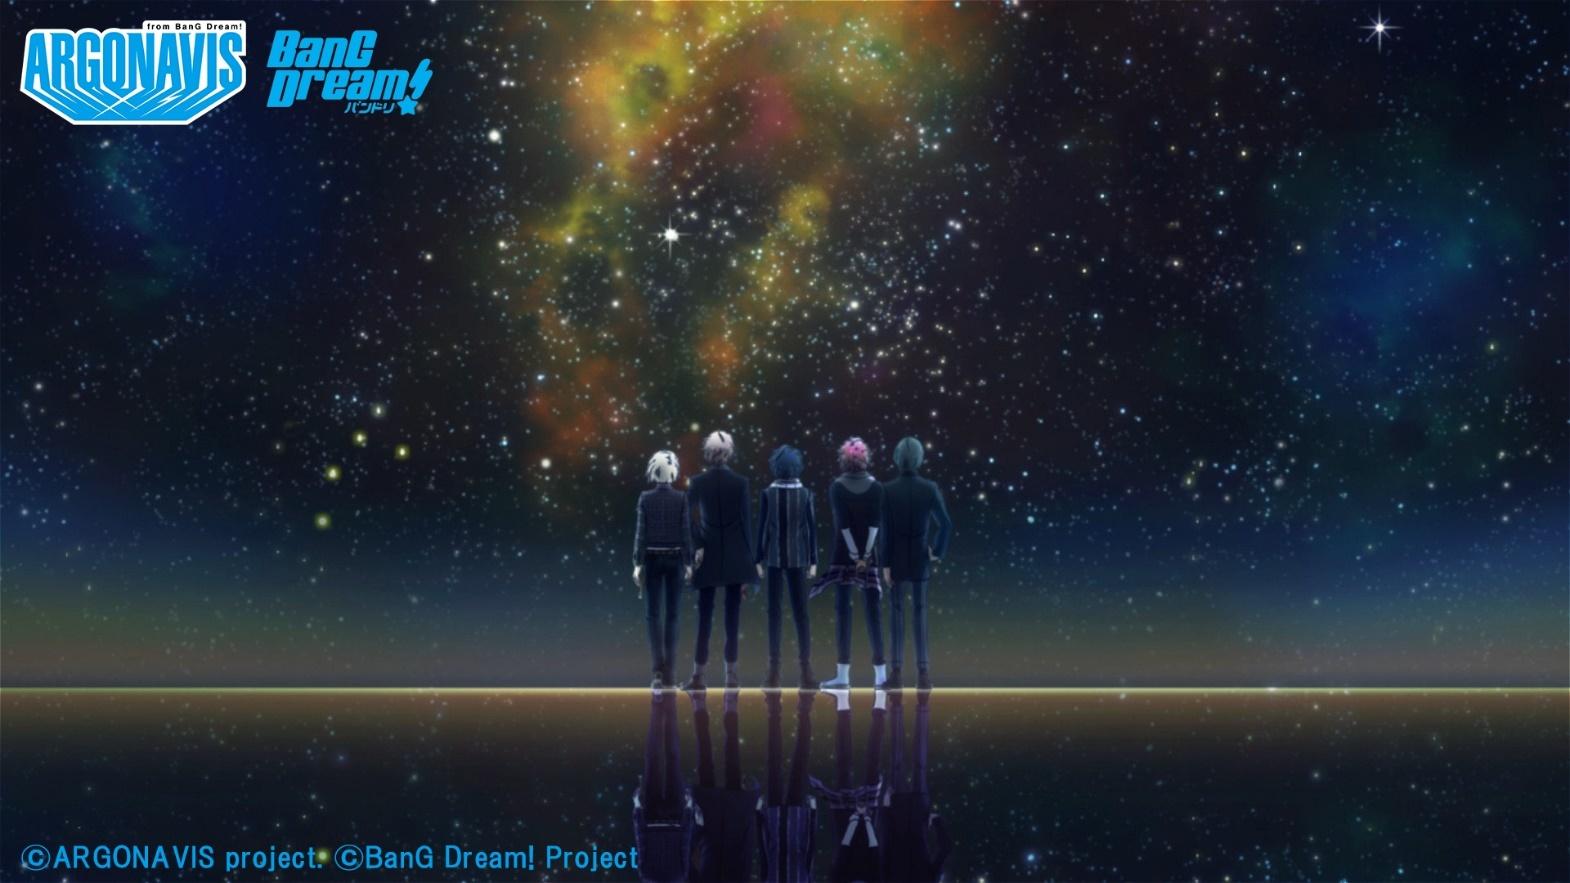 Argonavis「ゴールライン」アニメーションミュージックビデオ~short Ver.~より (C)ARGONAVIS project. (C)BanG Dream! Project